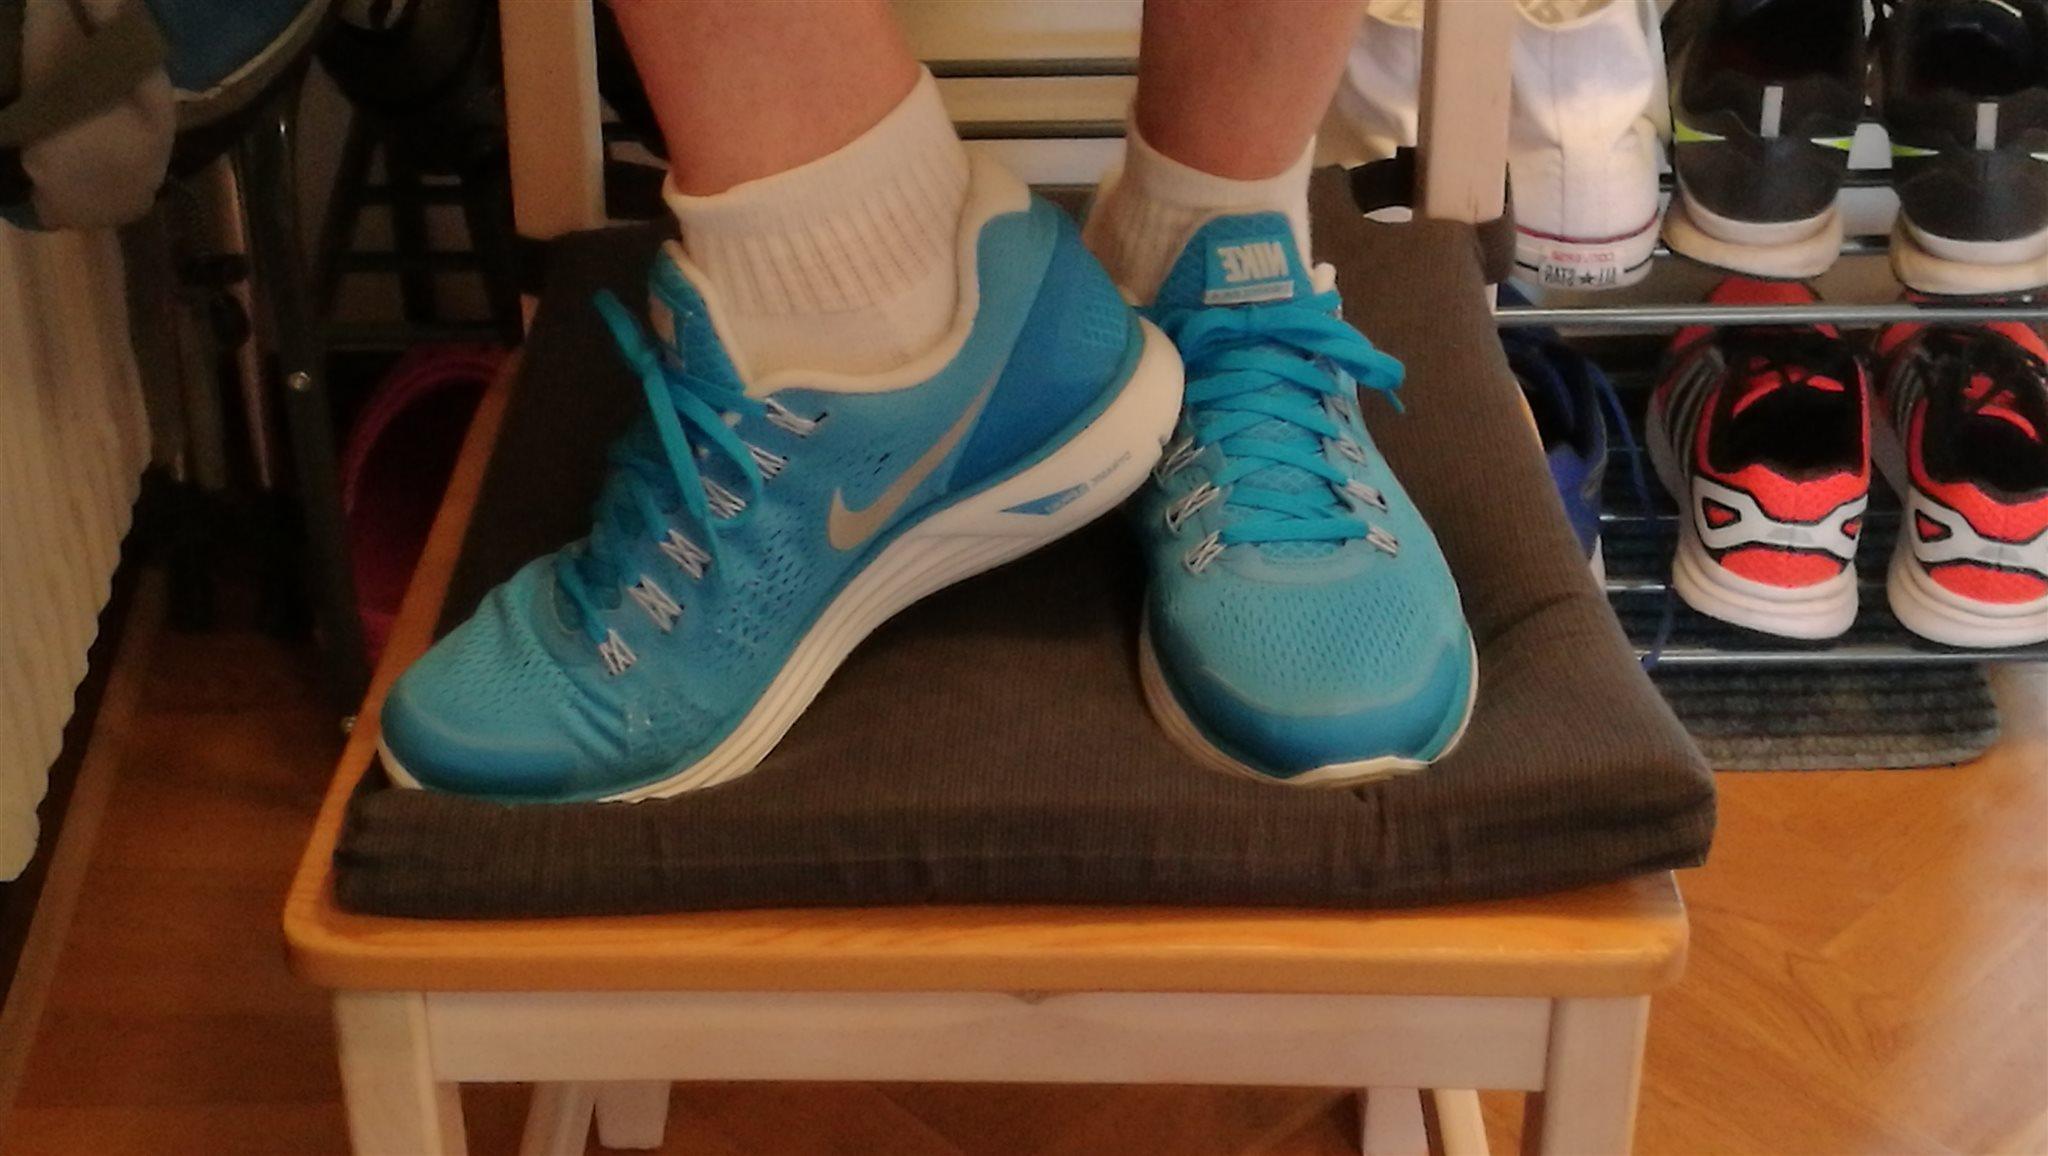 reputable site 5eb8f 0a5e4 Nike Lunarglide 4 training skor i stl 42.5 - (43  se mått) SUPERSKICK